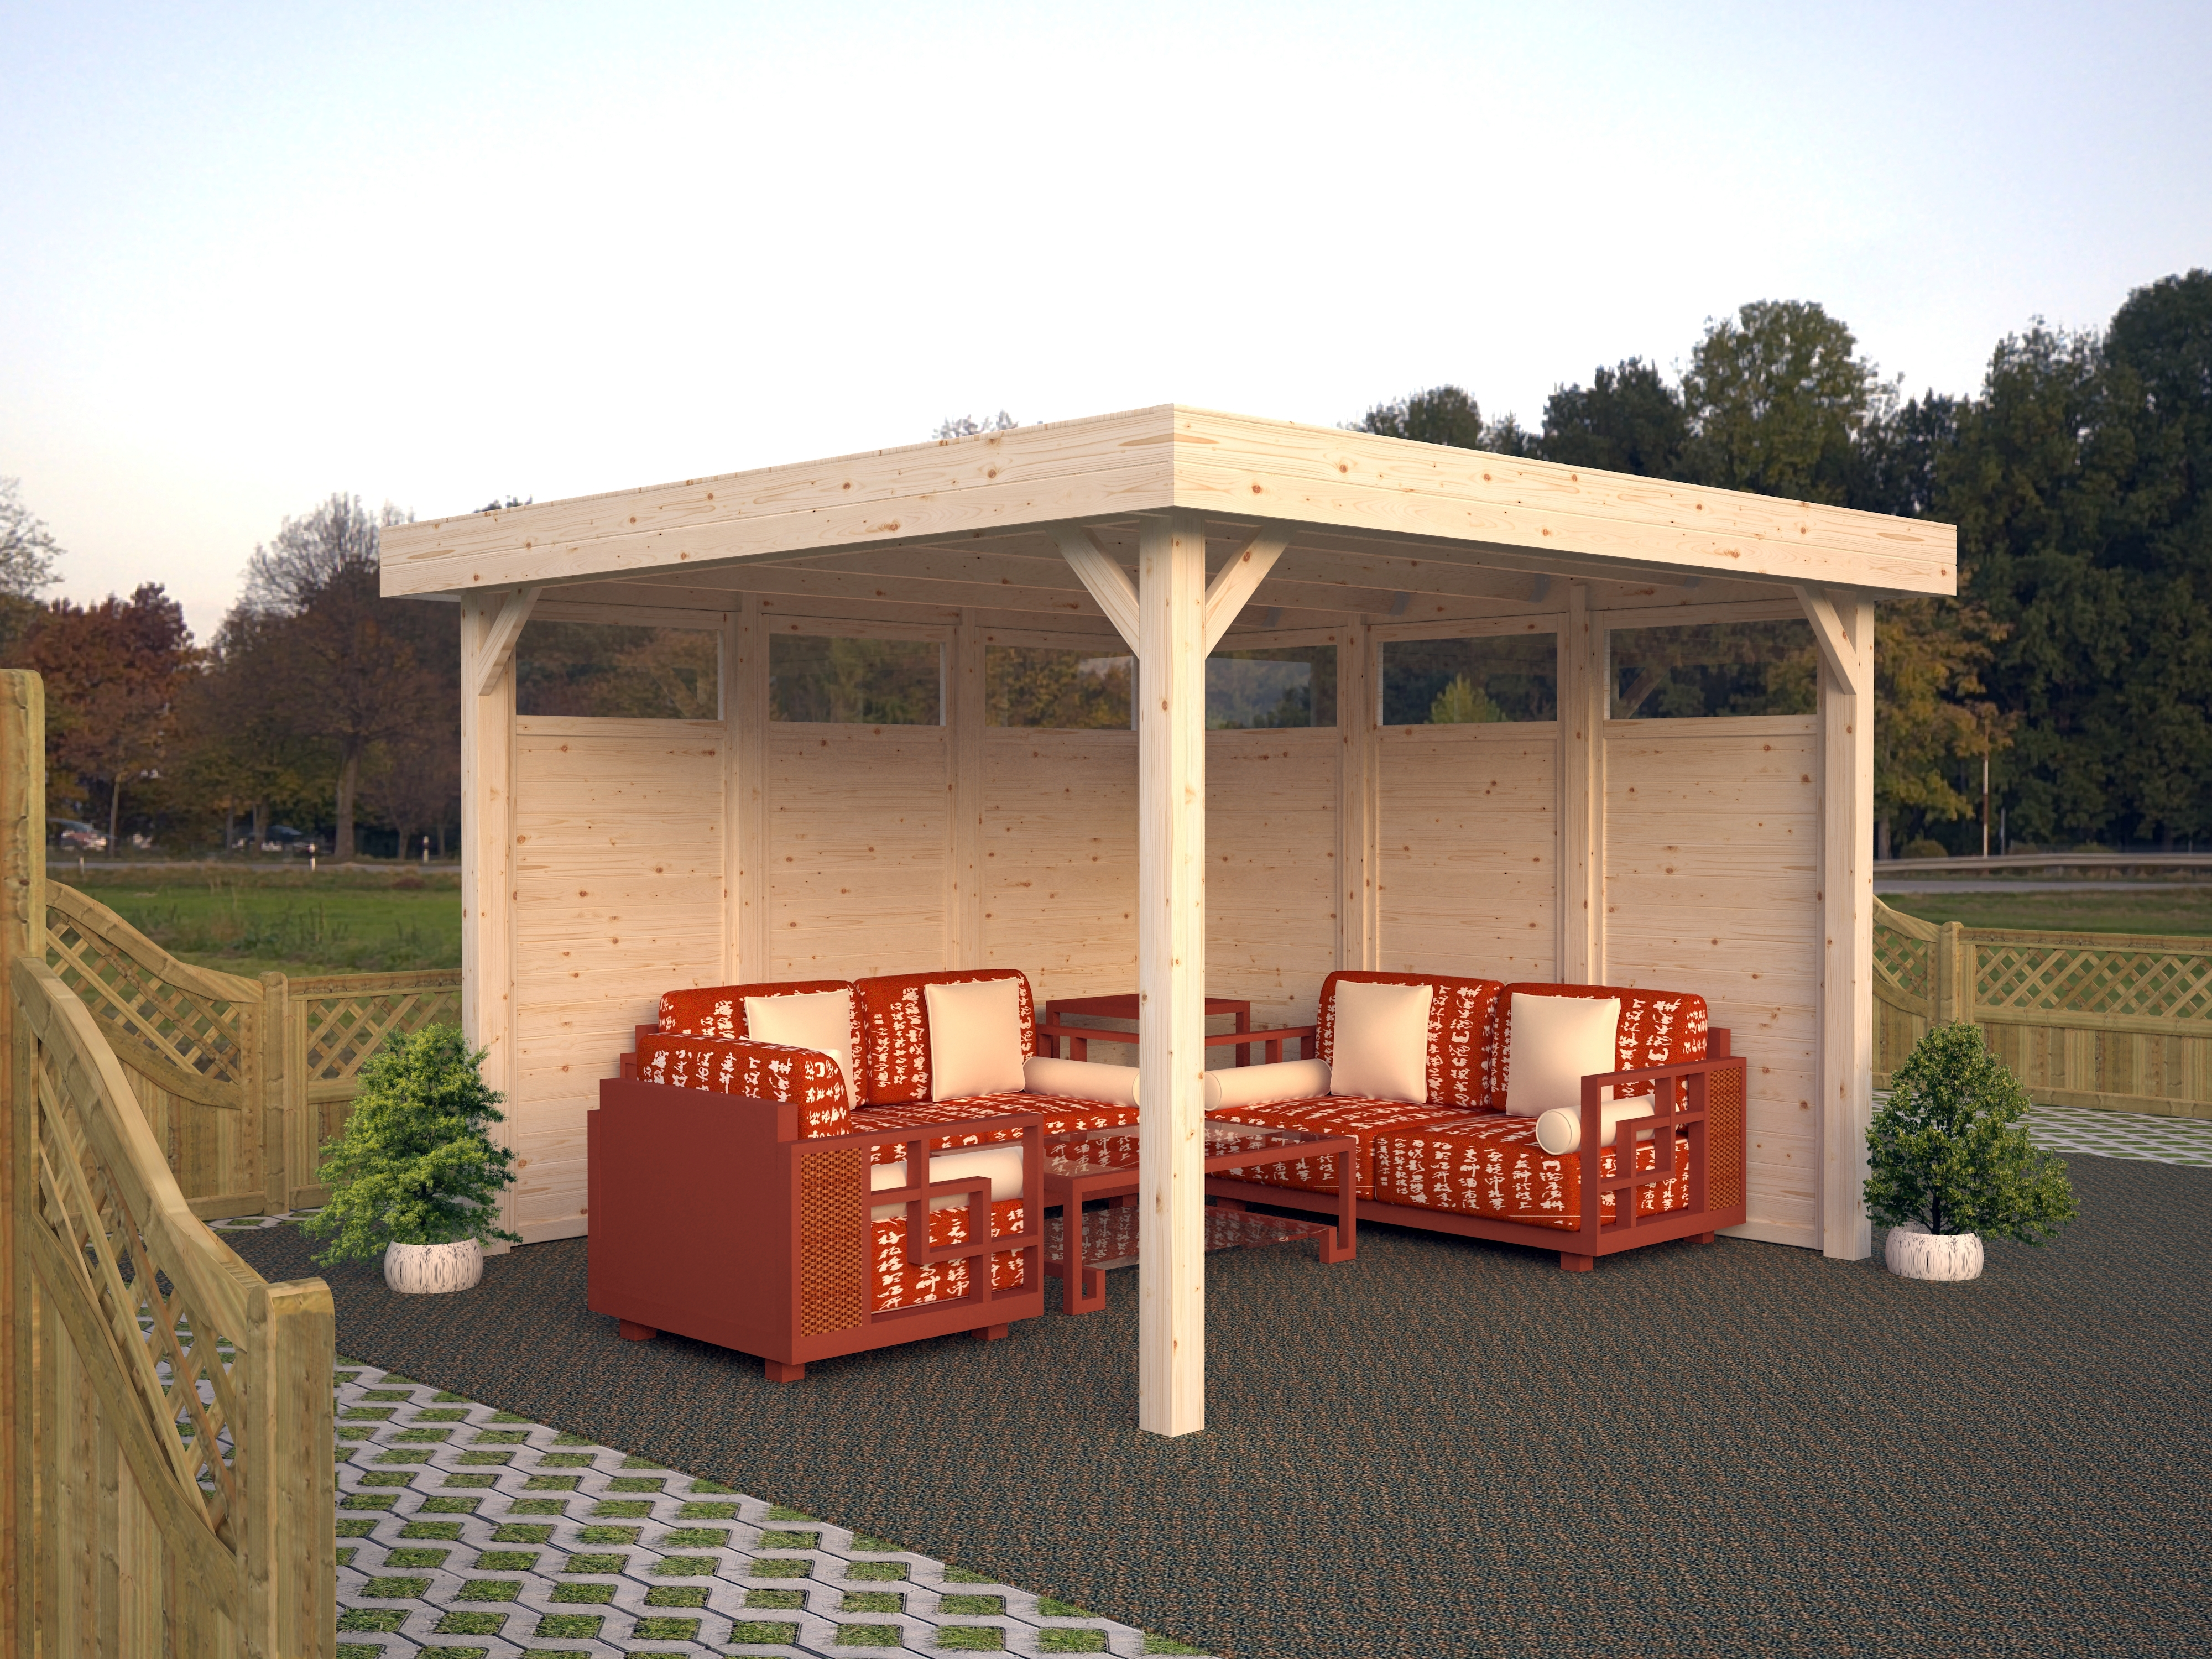 palmako gartenpavillon lucy 12 2 m pav 3535. Black Bedroom Furniture Sets. Home Design Ideas